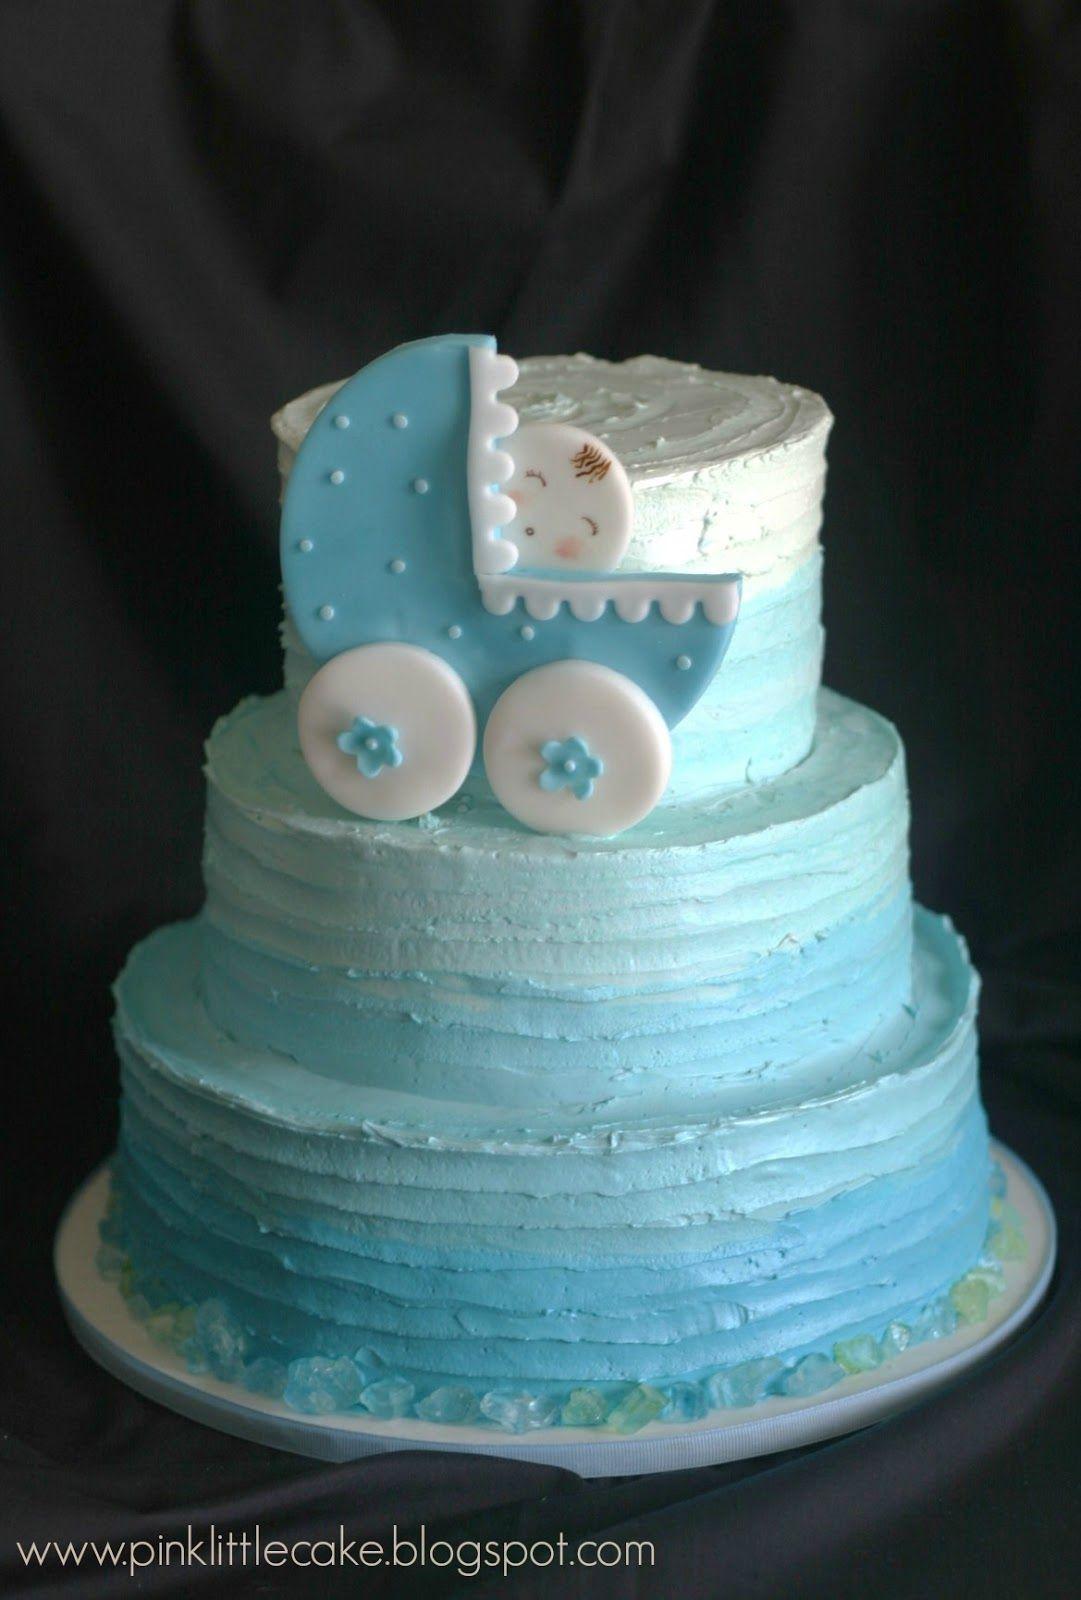 Rustic Baby Shower Sheet Cake : rustic, shower, sheet, Little, Cake:, Rustic, Ombre, Shower, Cake,, Sheet, Cakes,